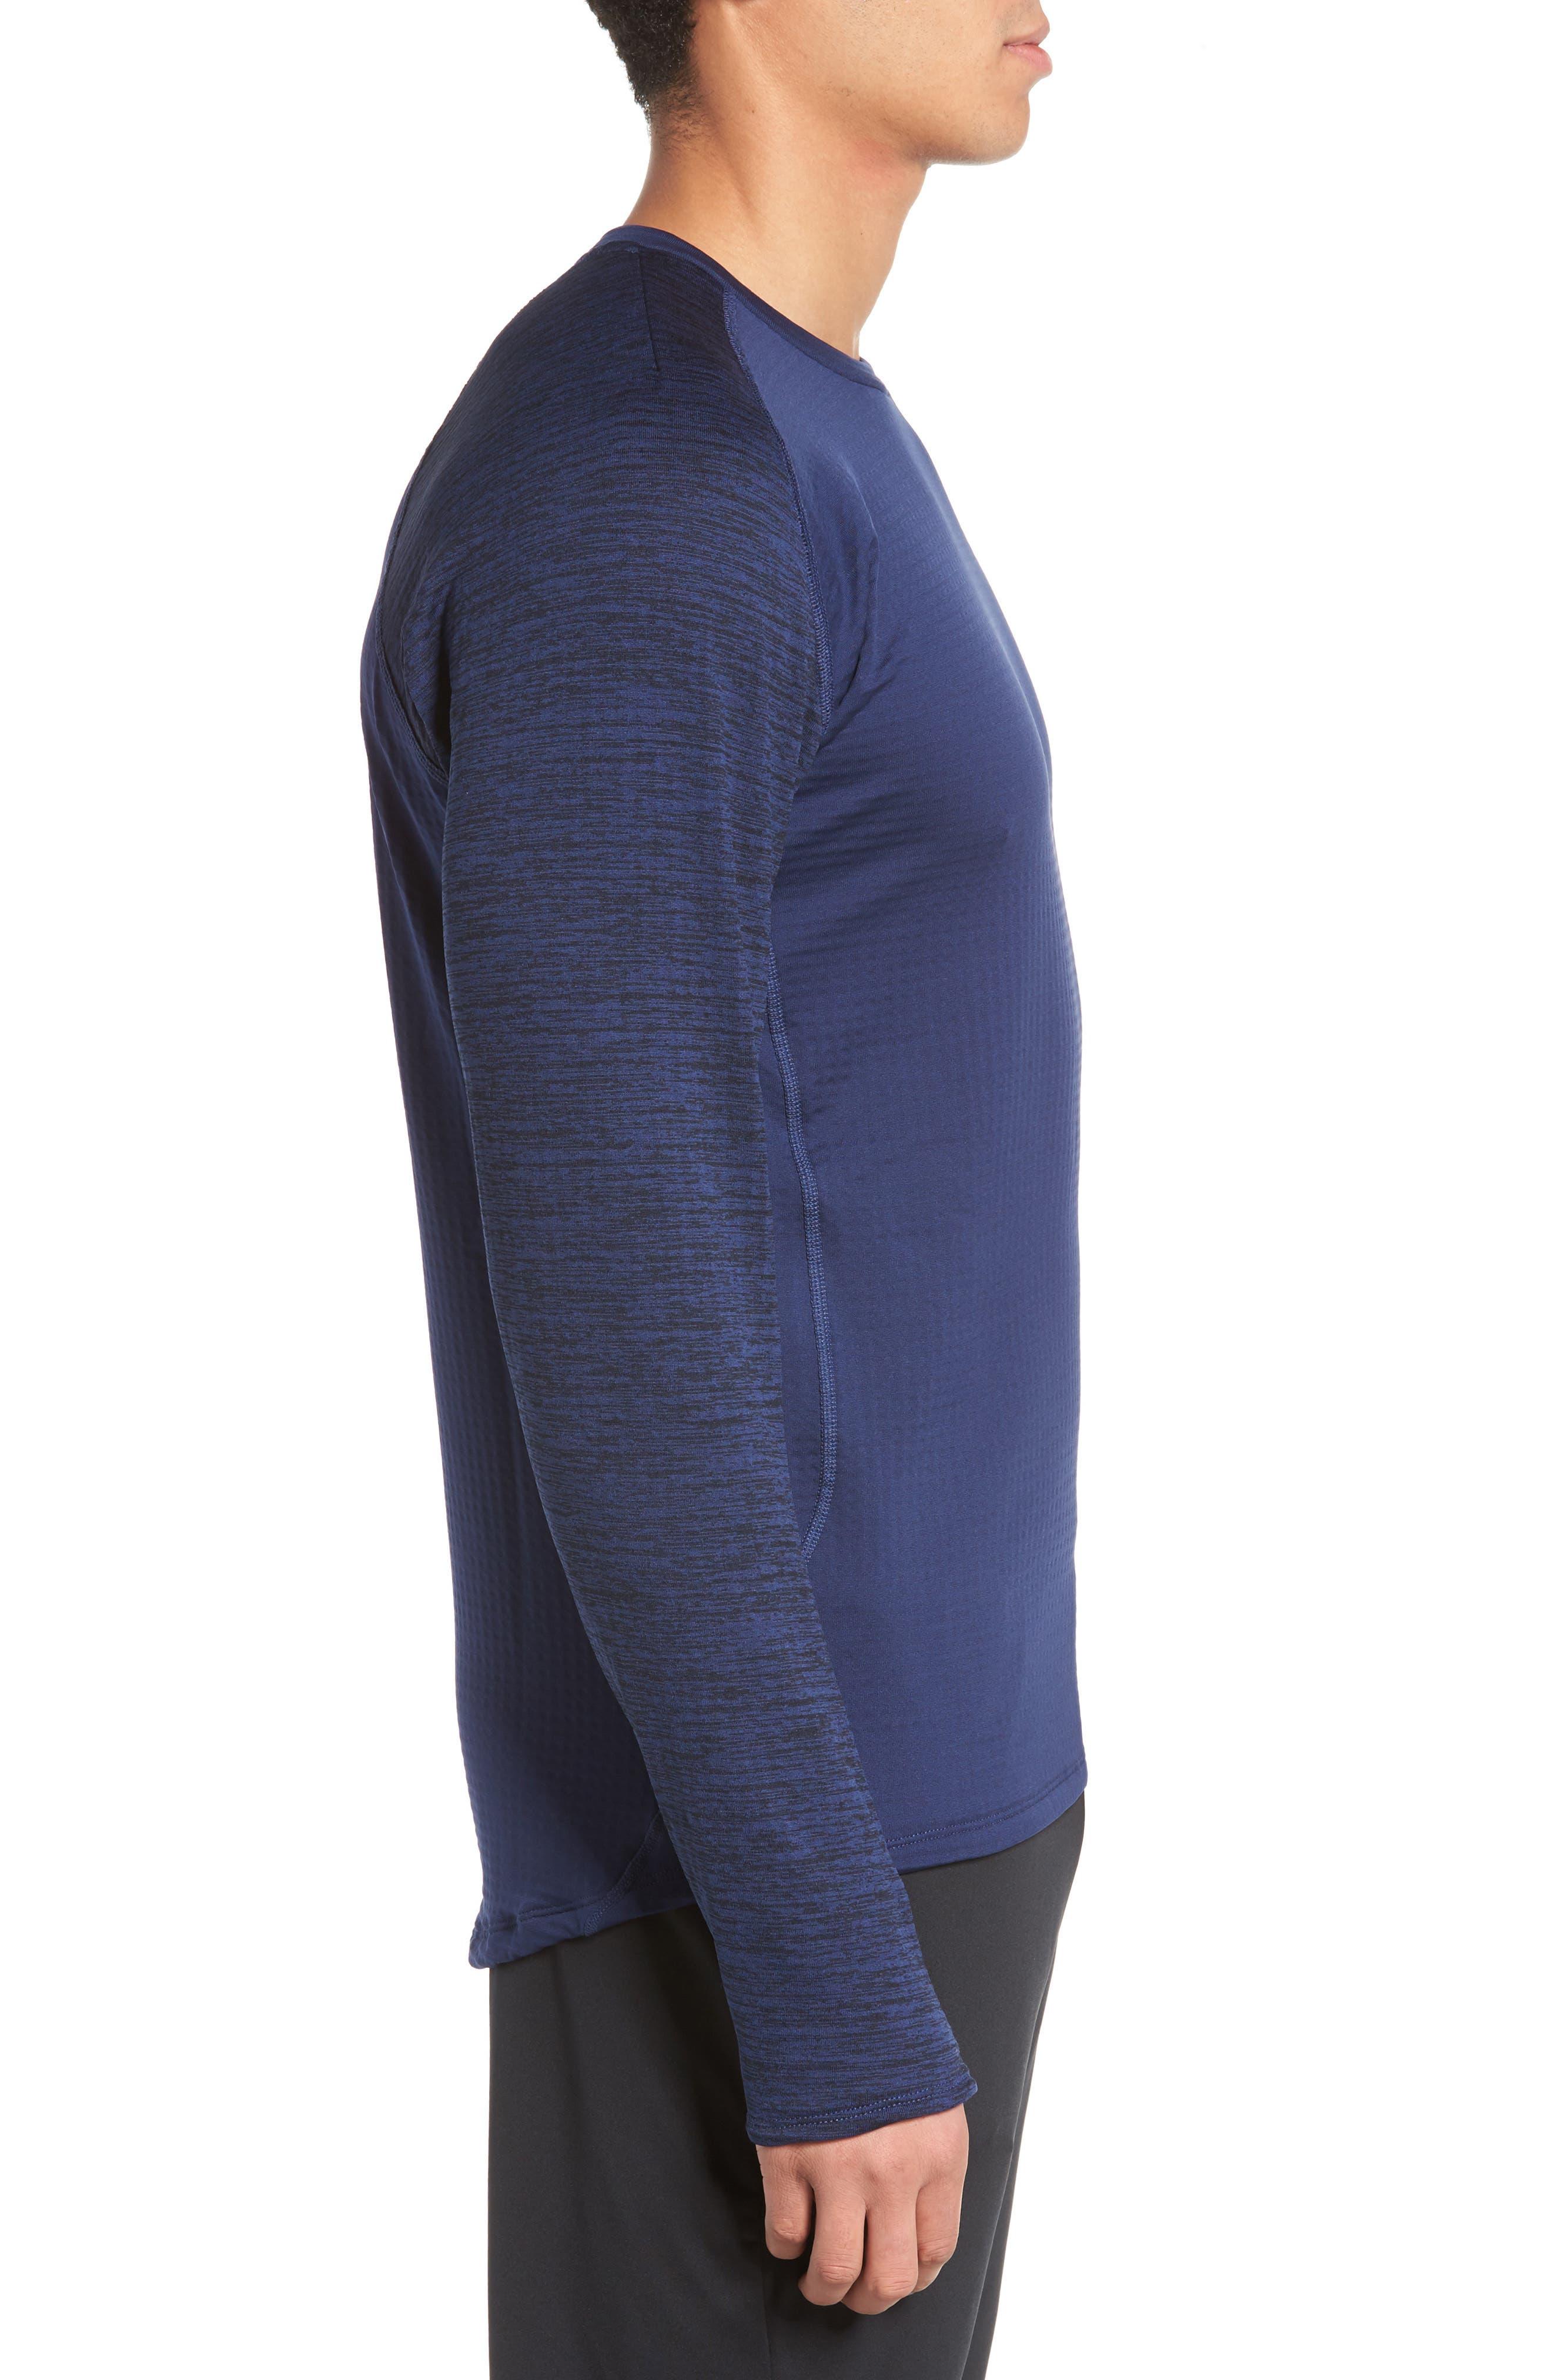 ThermaSphere Long Sleeve Running T-Shirt,                             Alternate thumbnail 7, color,                             Binary Blue/ Purple/ Heather